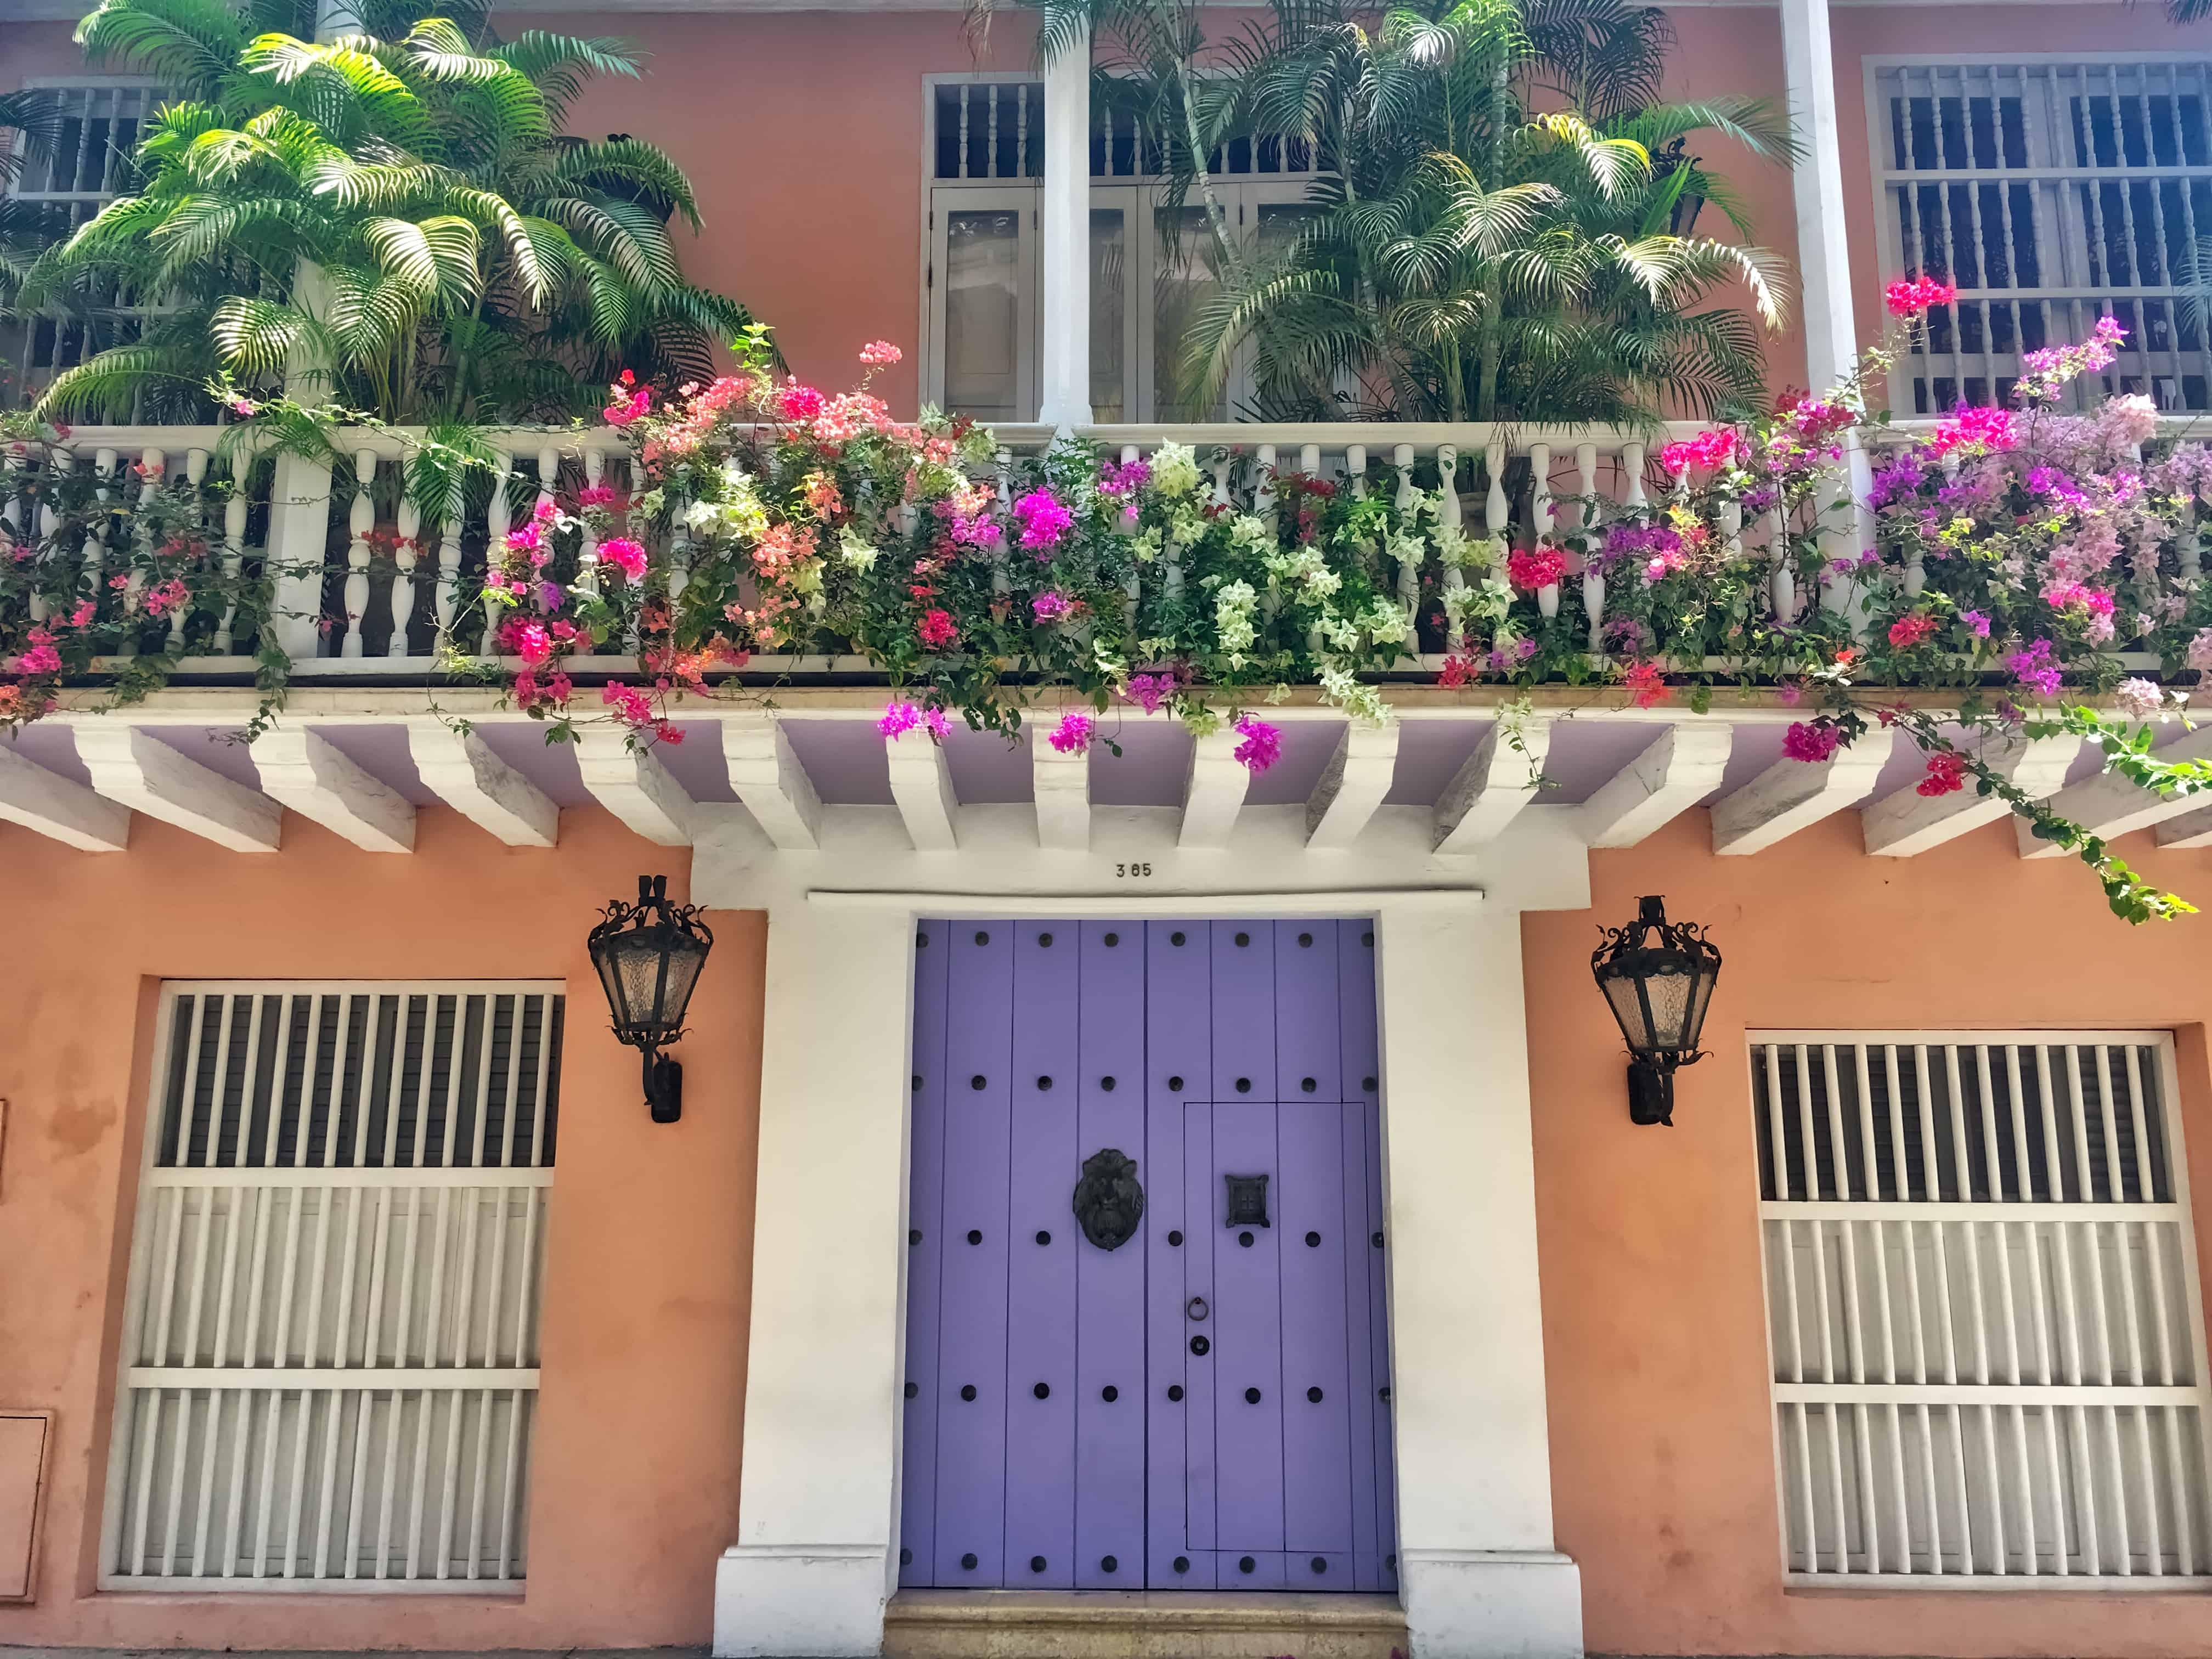 Cartagena Walking Tour - Colorful building and door